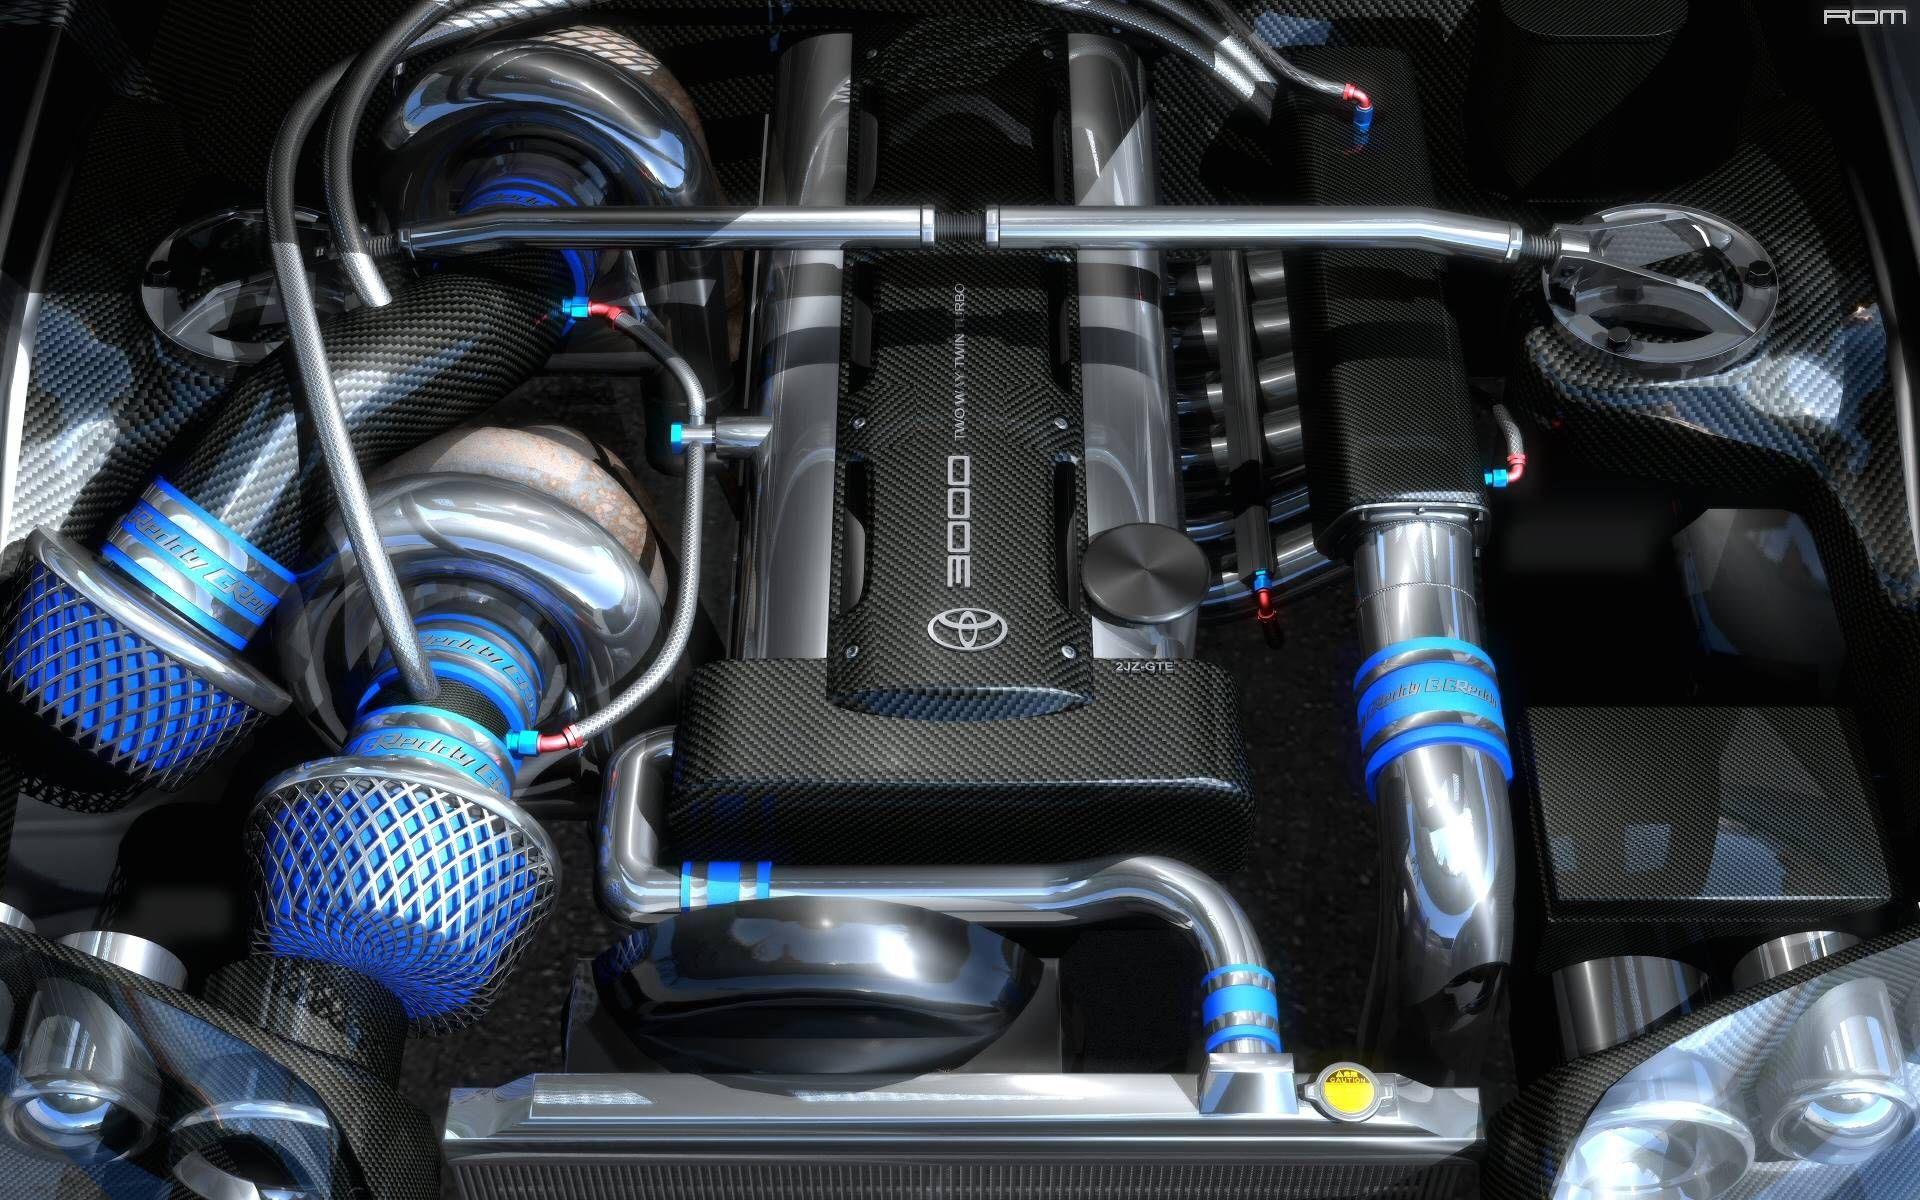 Twin Turbo Toyota Supra Engine (2JZ) (1920x1200) | love horsepower | Toyota supra, Toyota, Cars